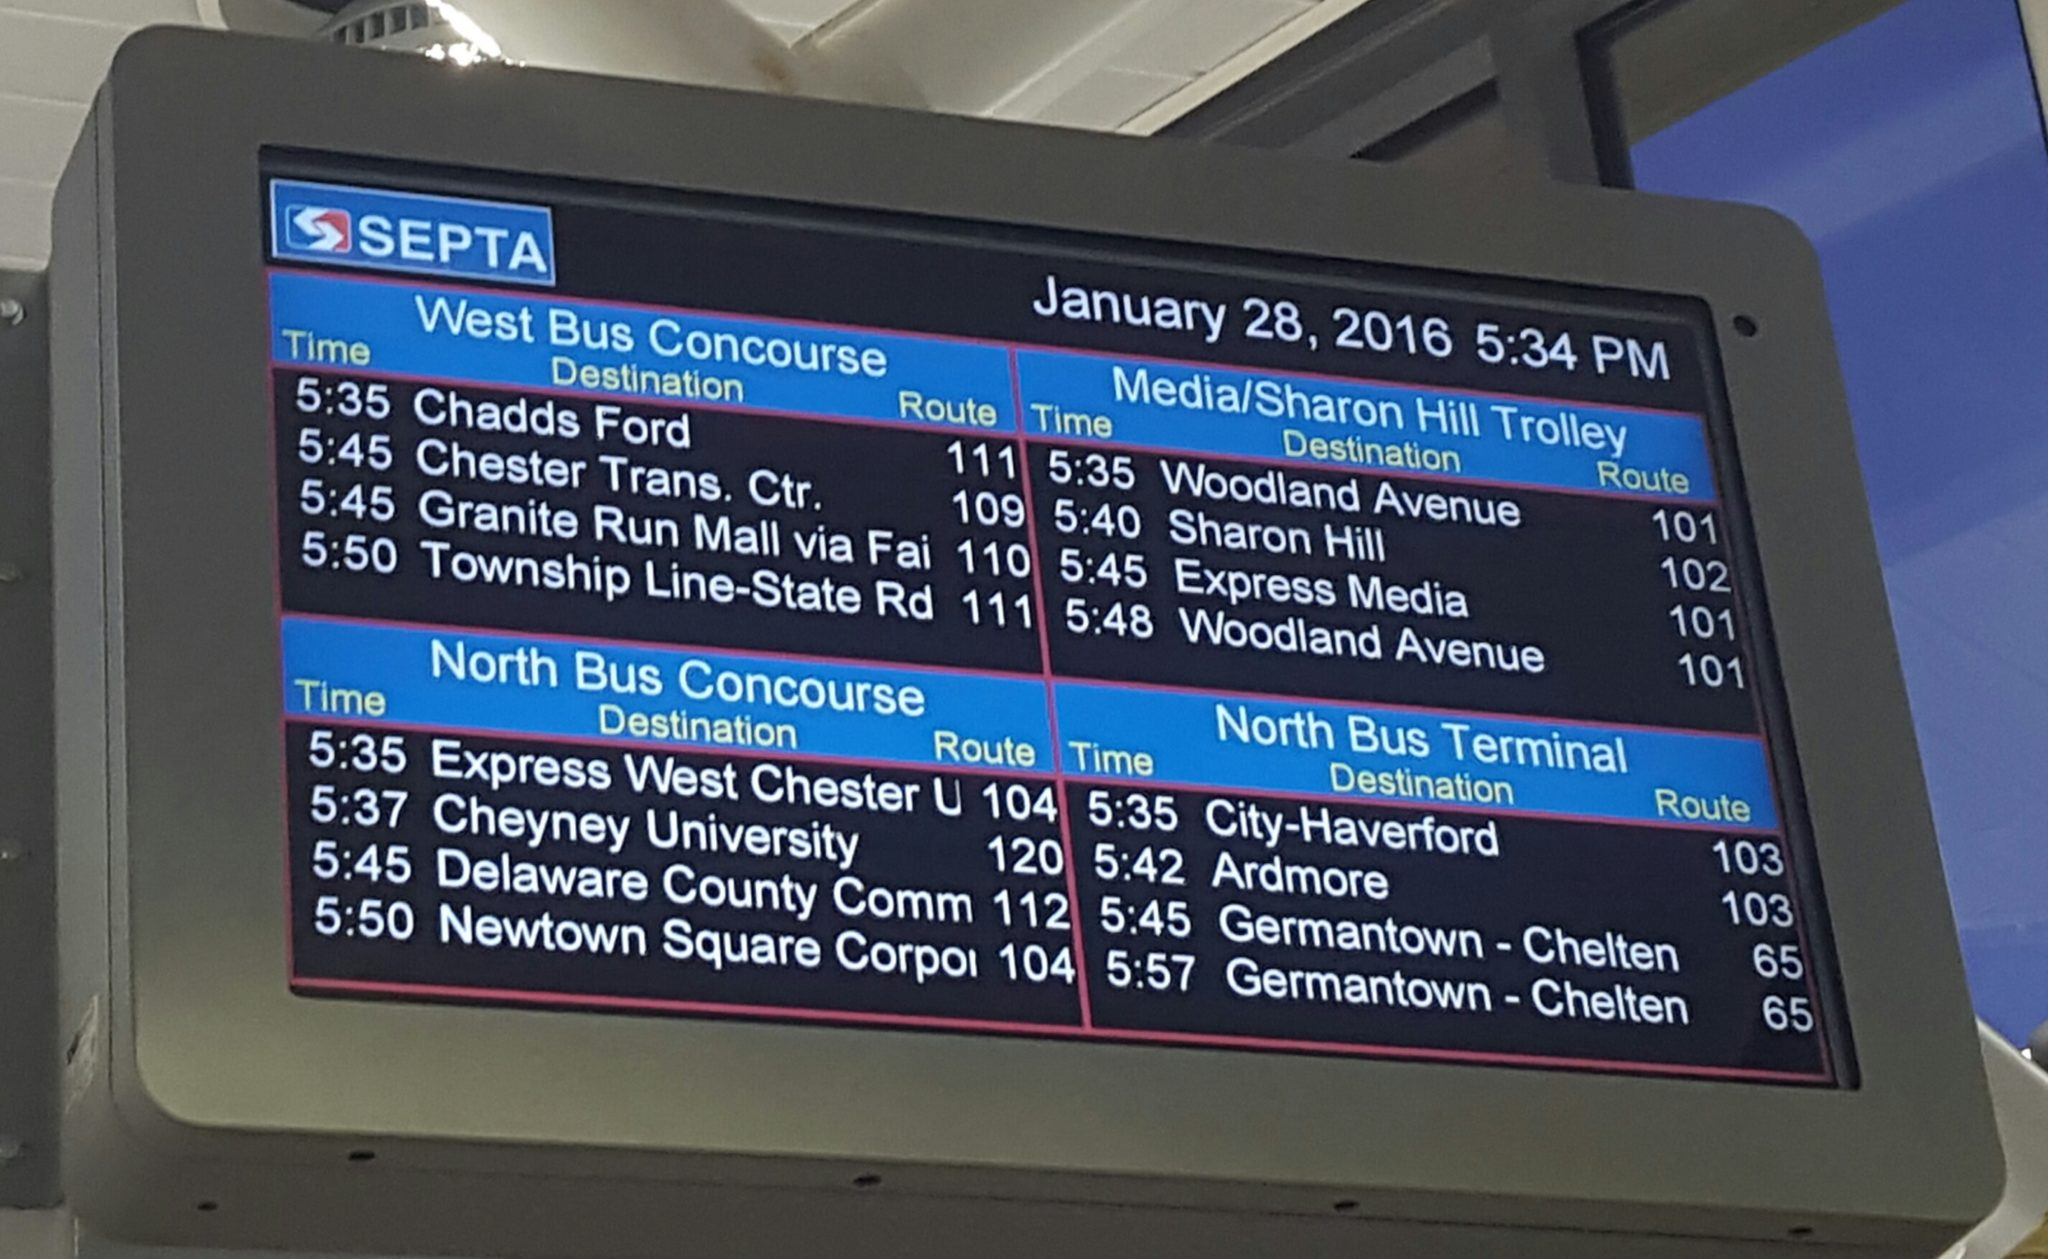 Daktronics | Reliable and Rugged Railway Station Displays